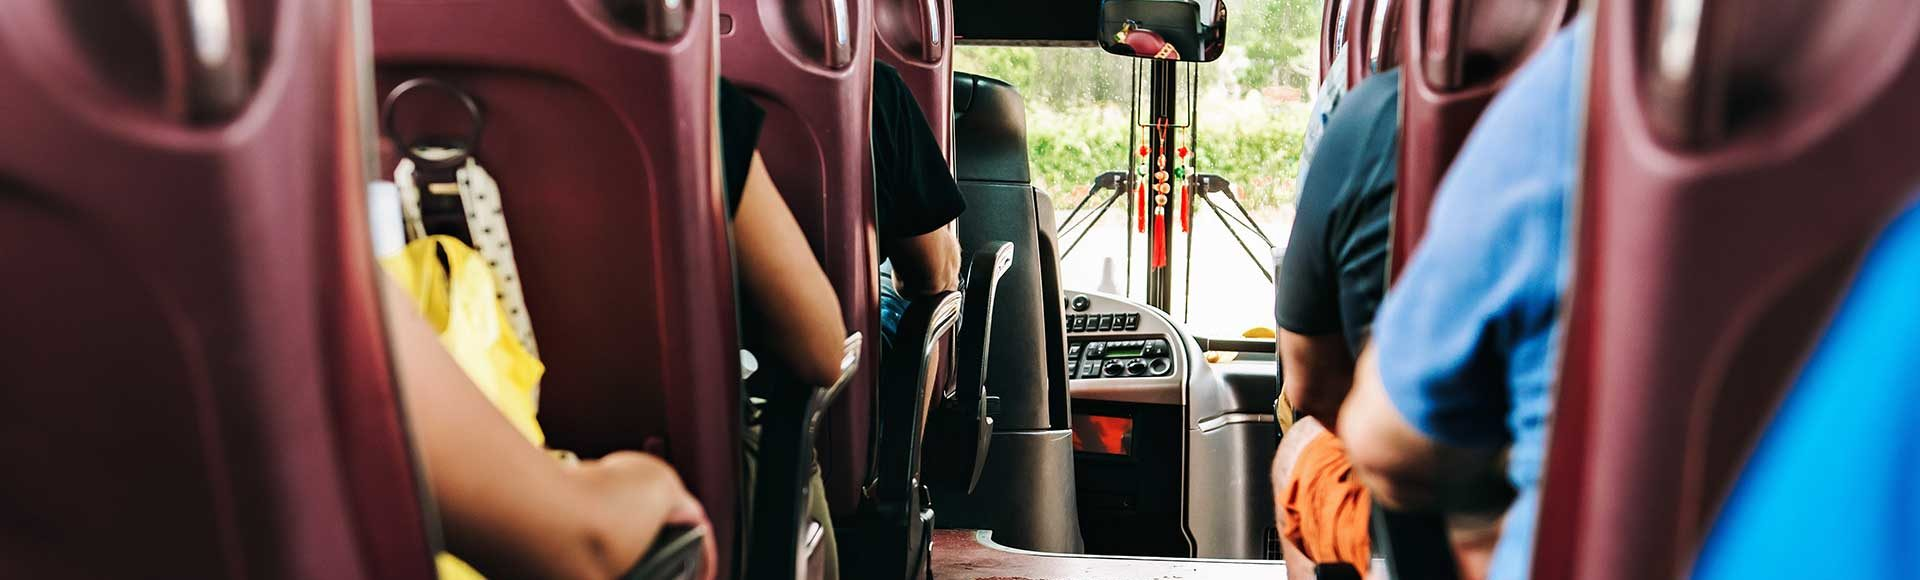 Busreisen Shutterstock 1